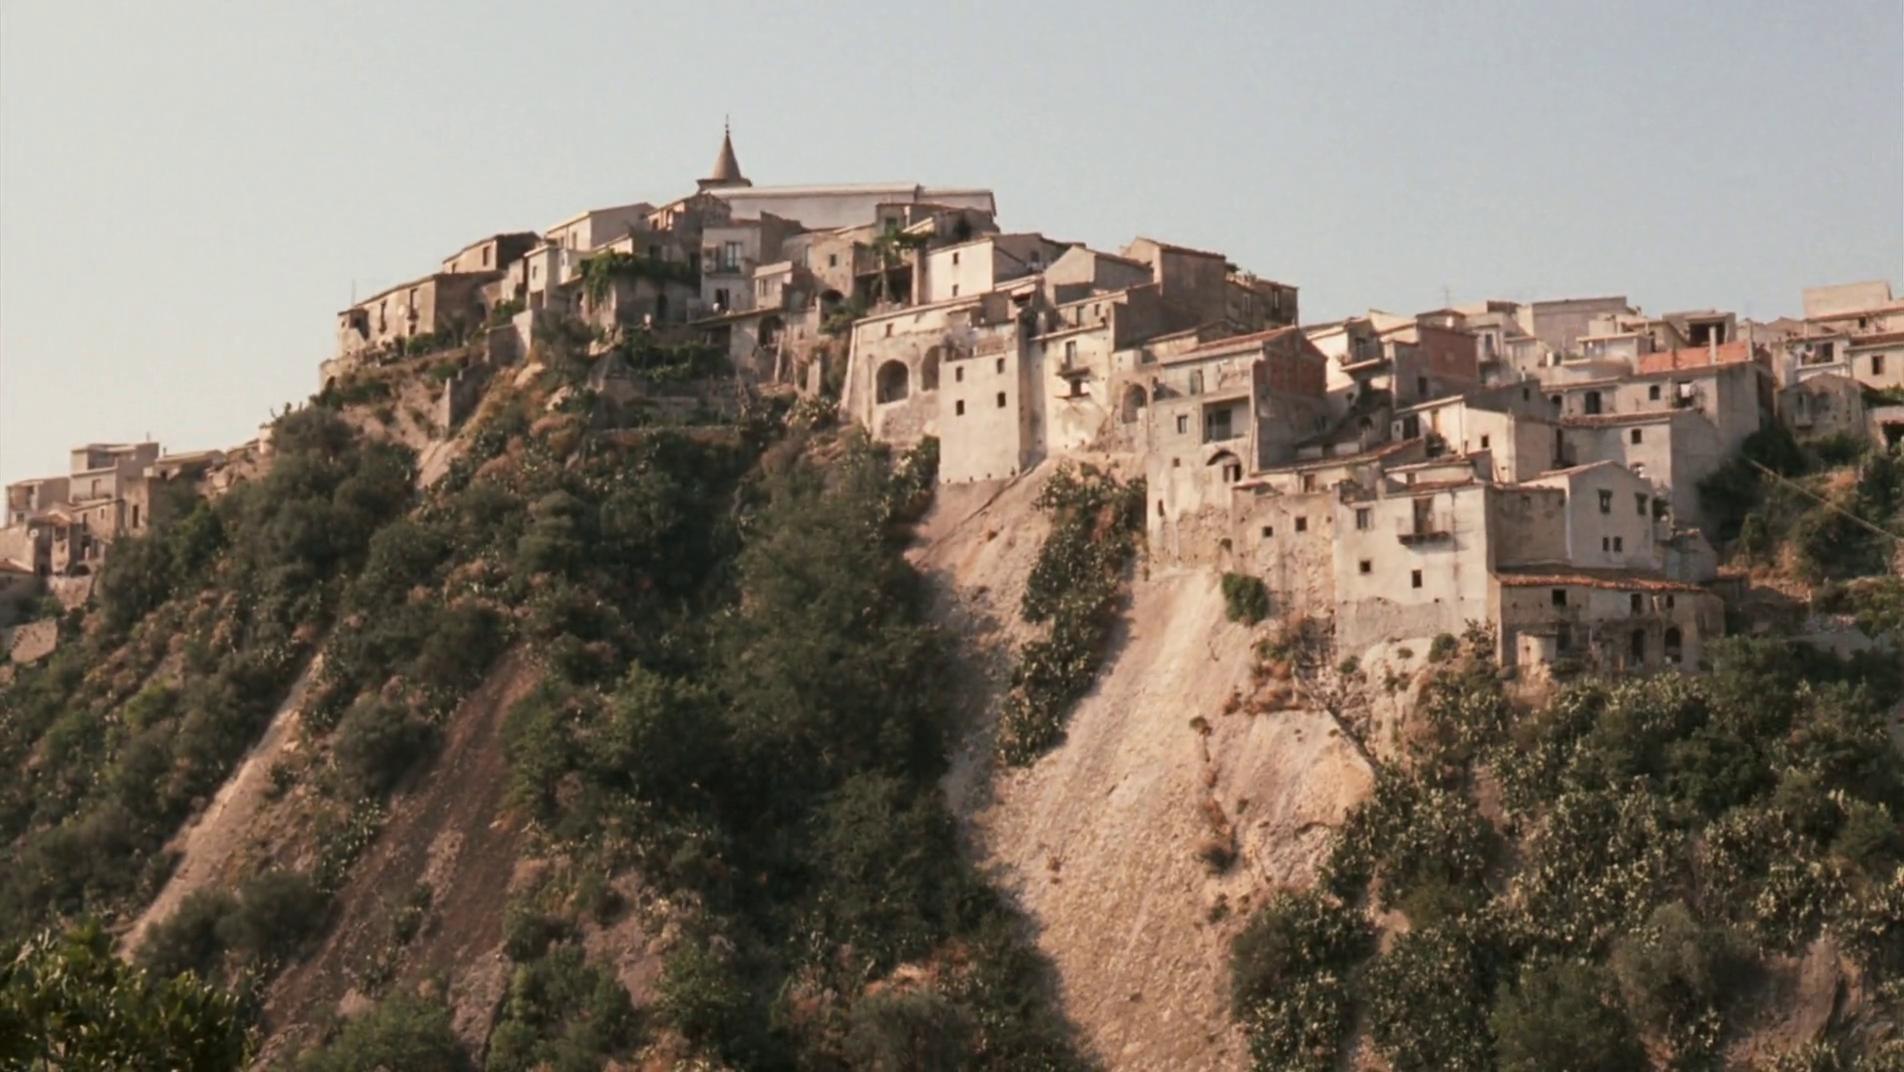 Corleone | The Godfath...